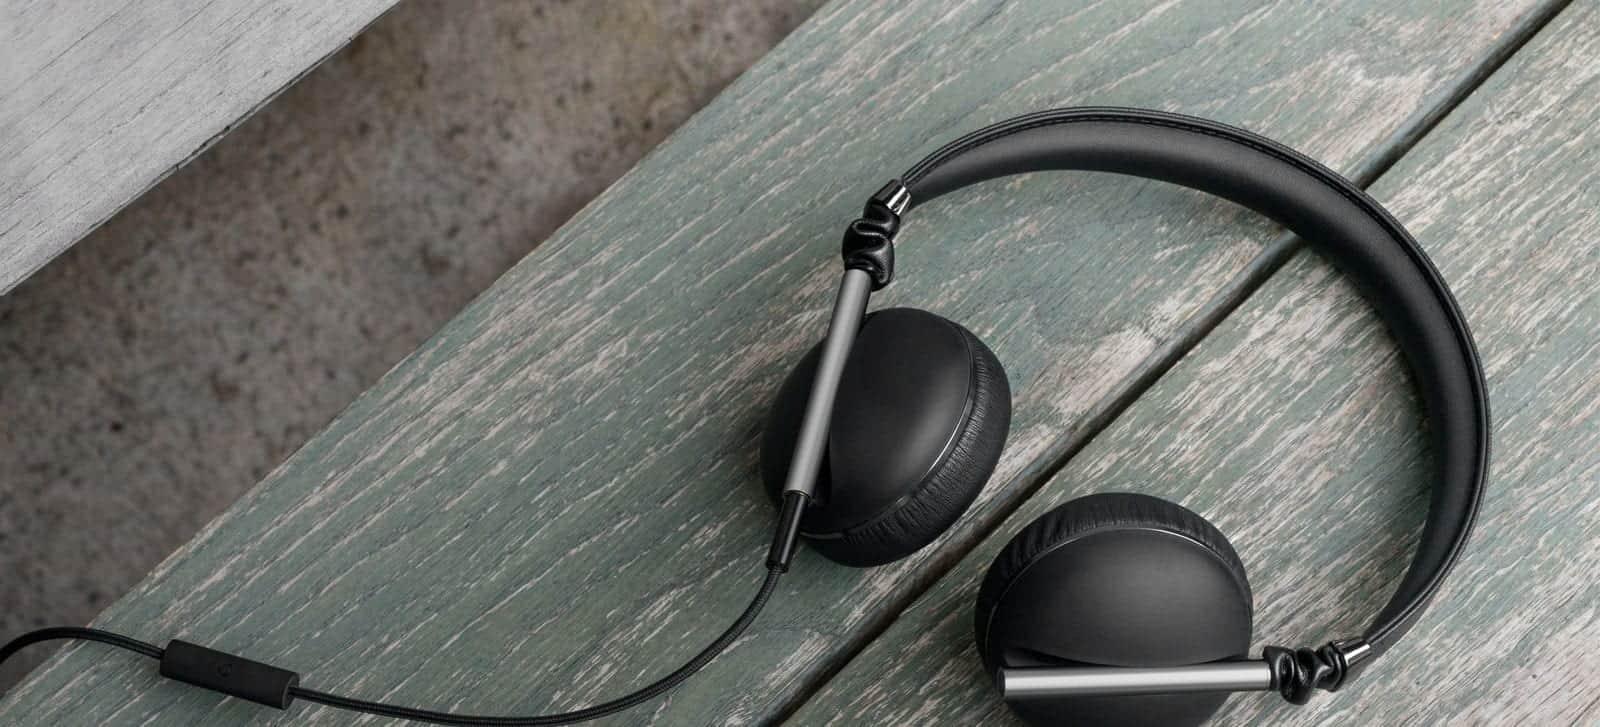 best podcasting headset